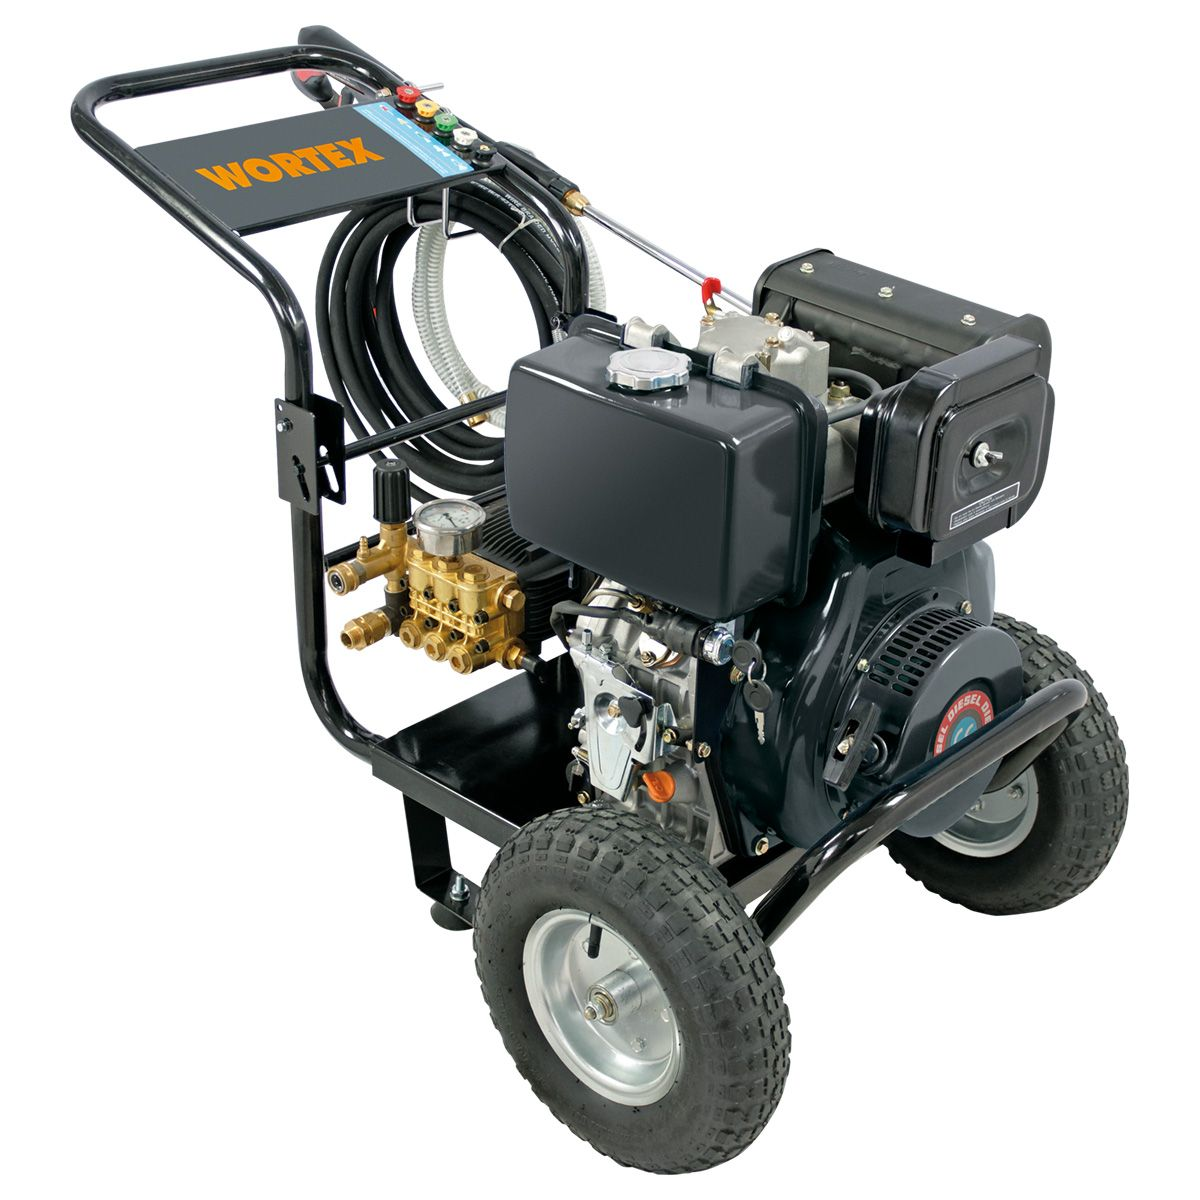 WORTEX LW 12/180 Idropulitrice 186bar Benzina